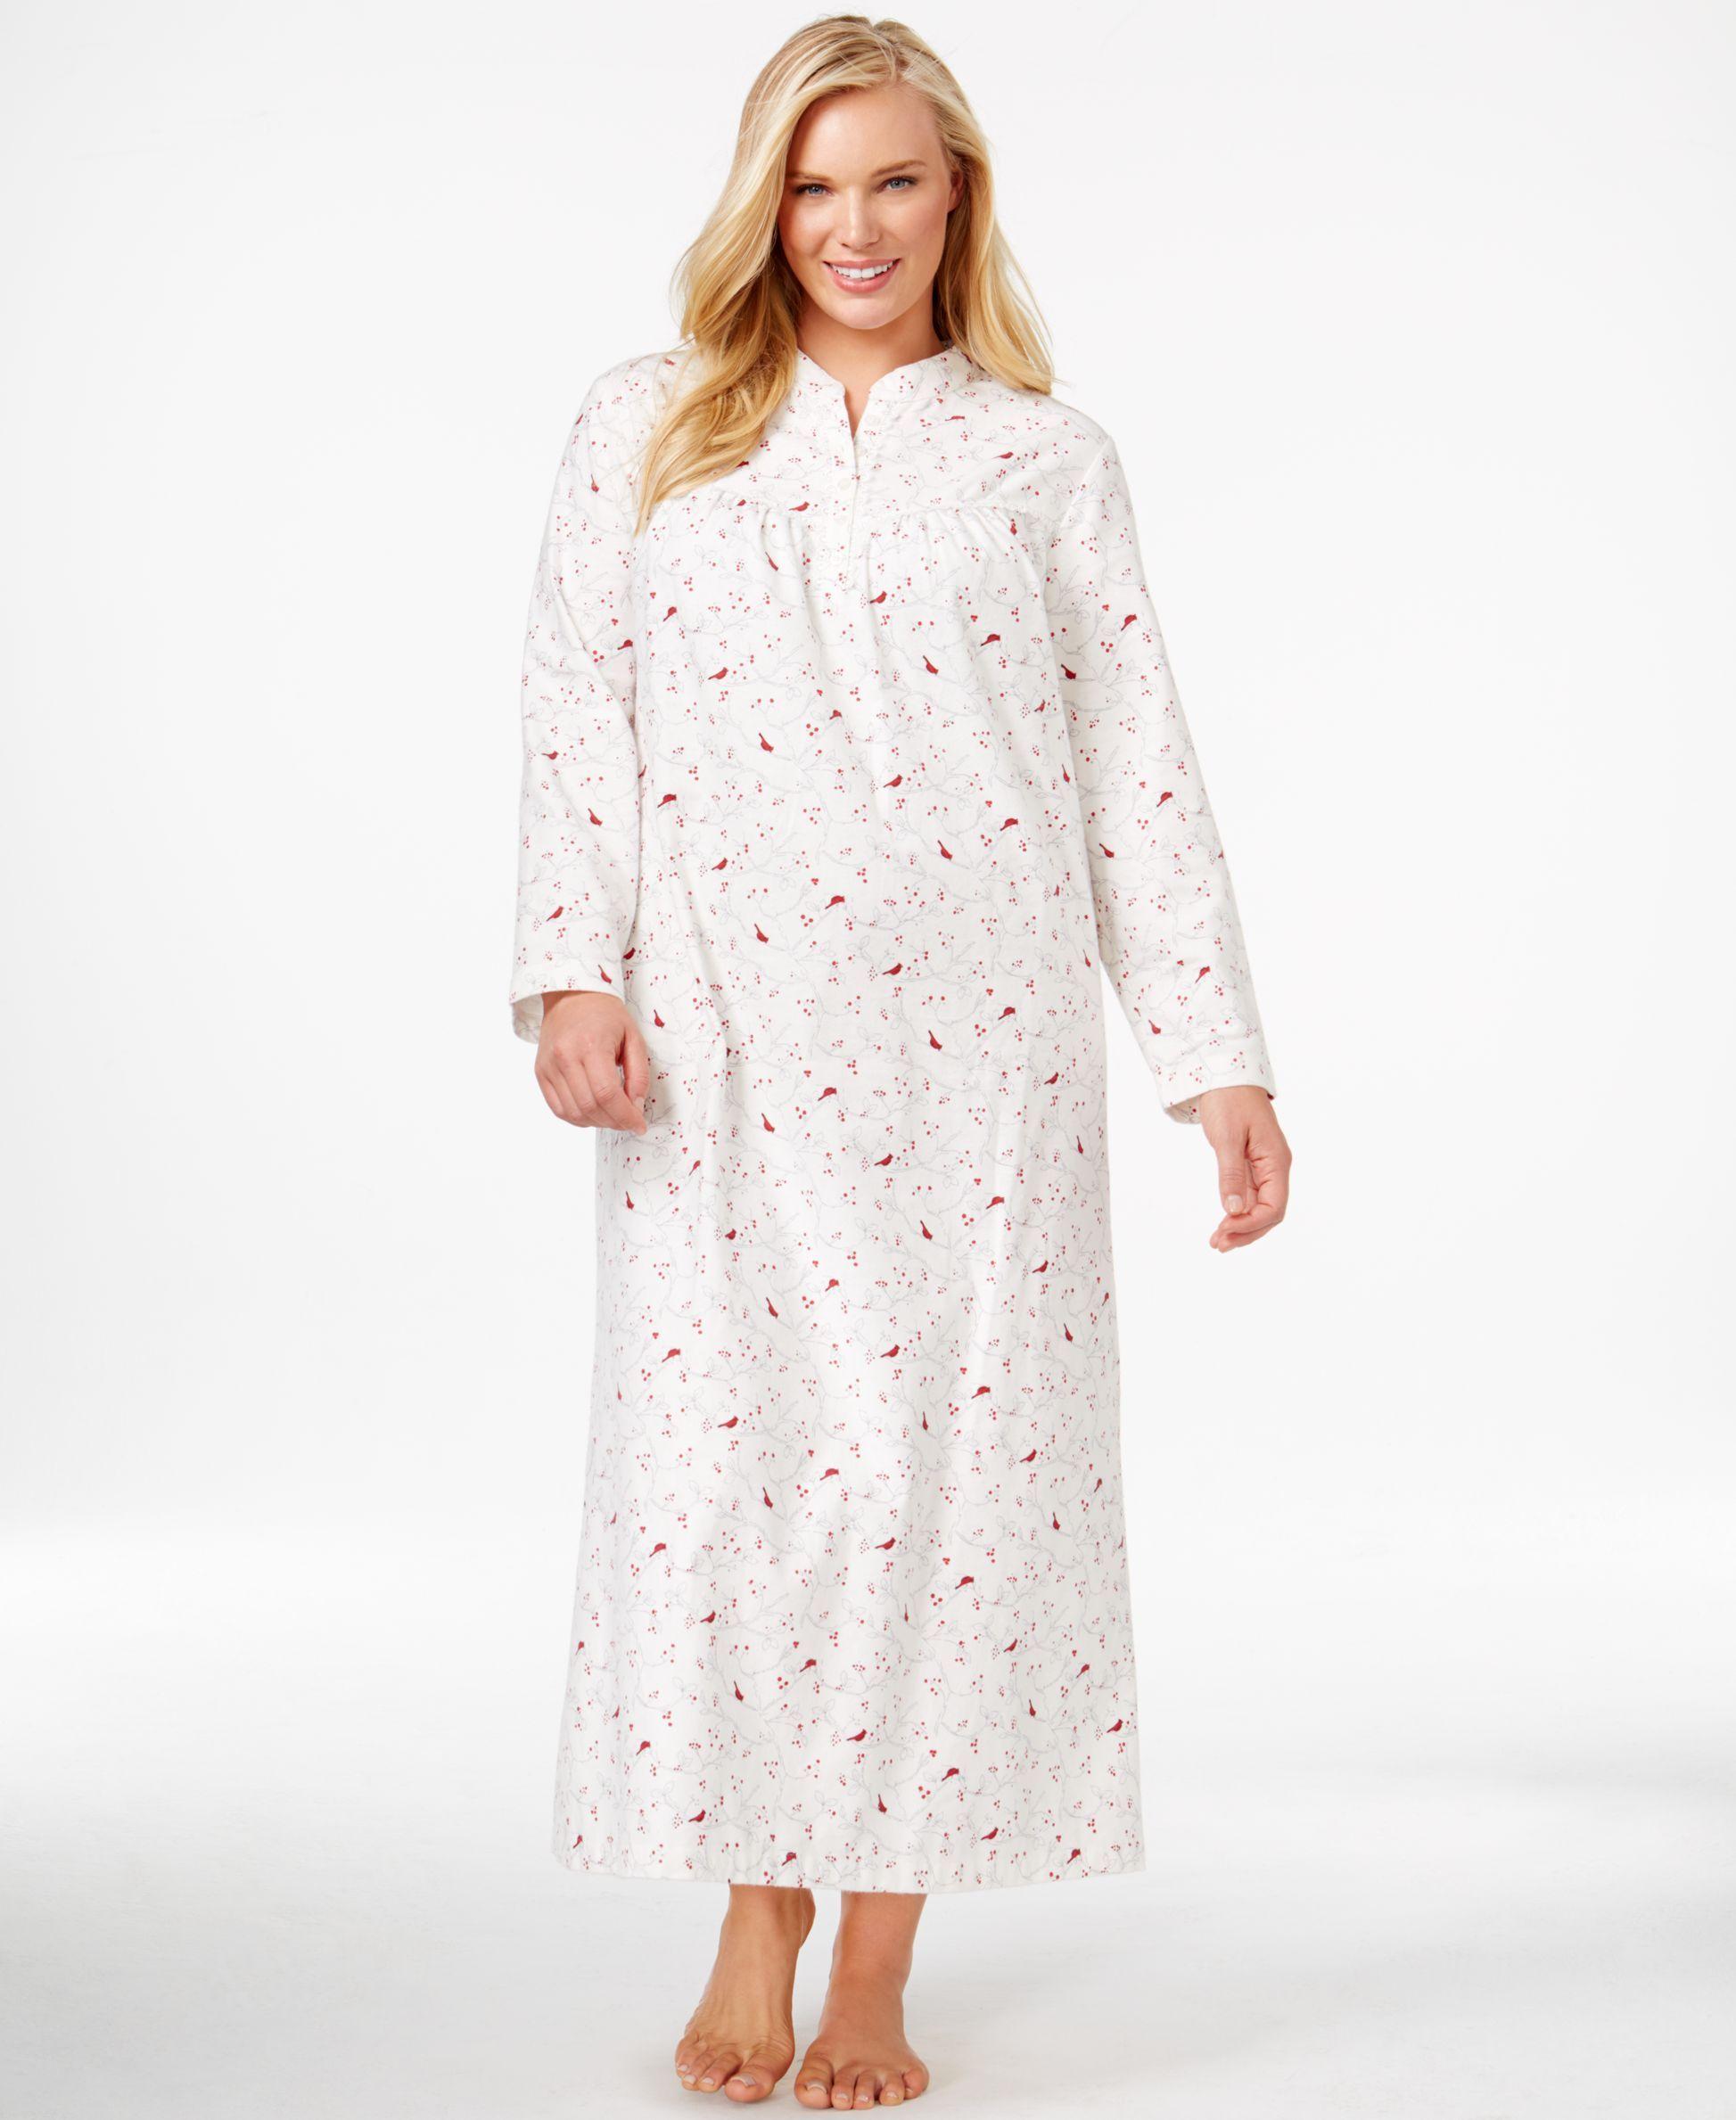 83718ffdaa3 Charter Club Plus Size Long Flannel Nightgown